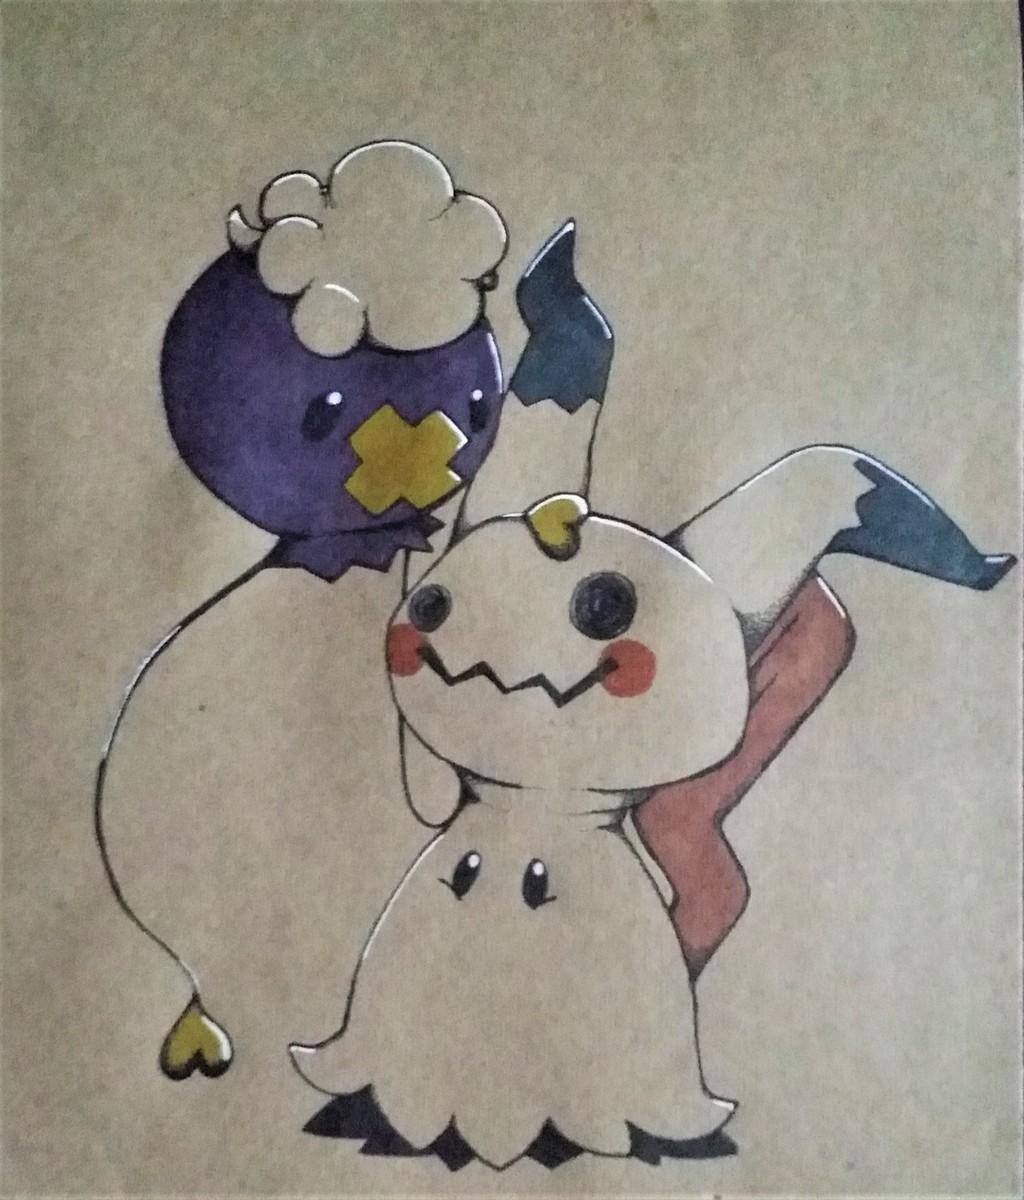 Drifloon and Mimikyu Cuddles